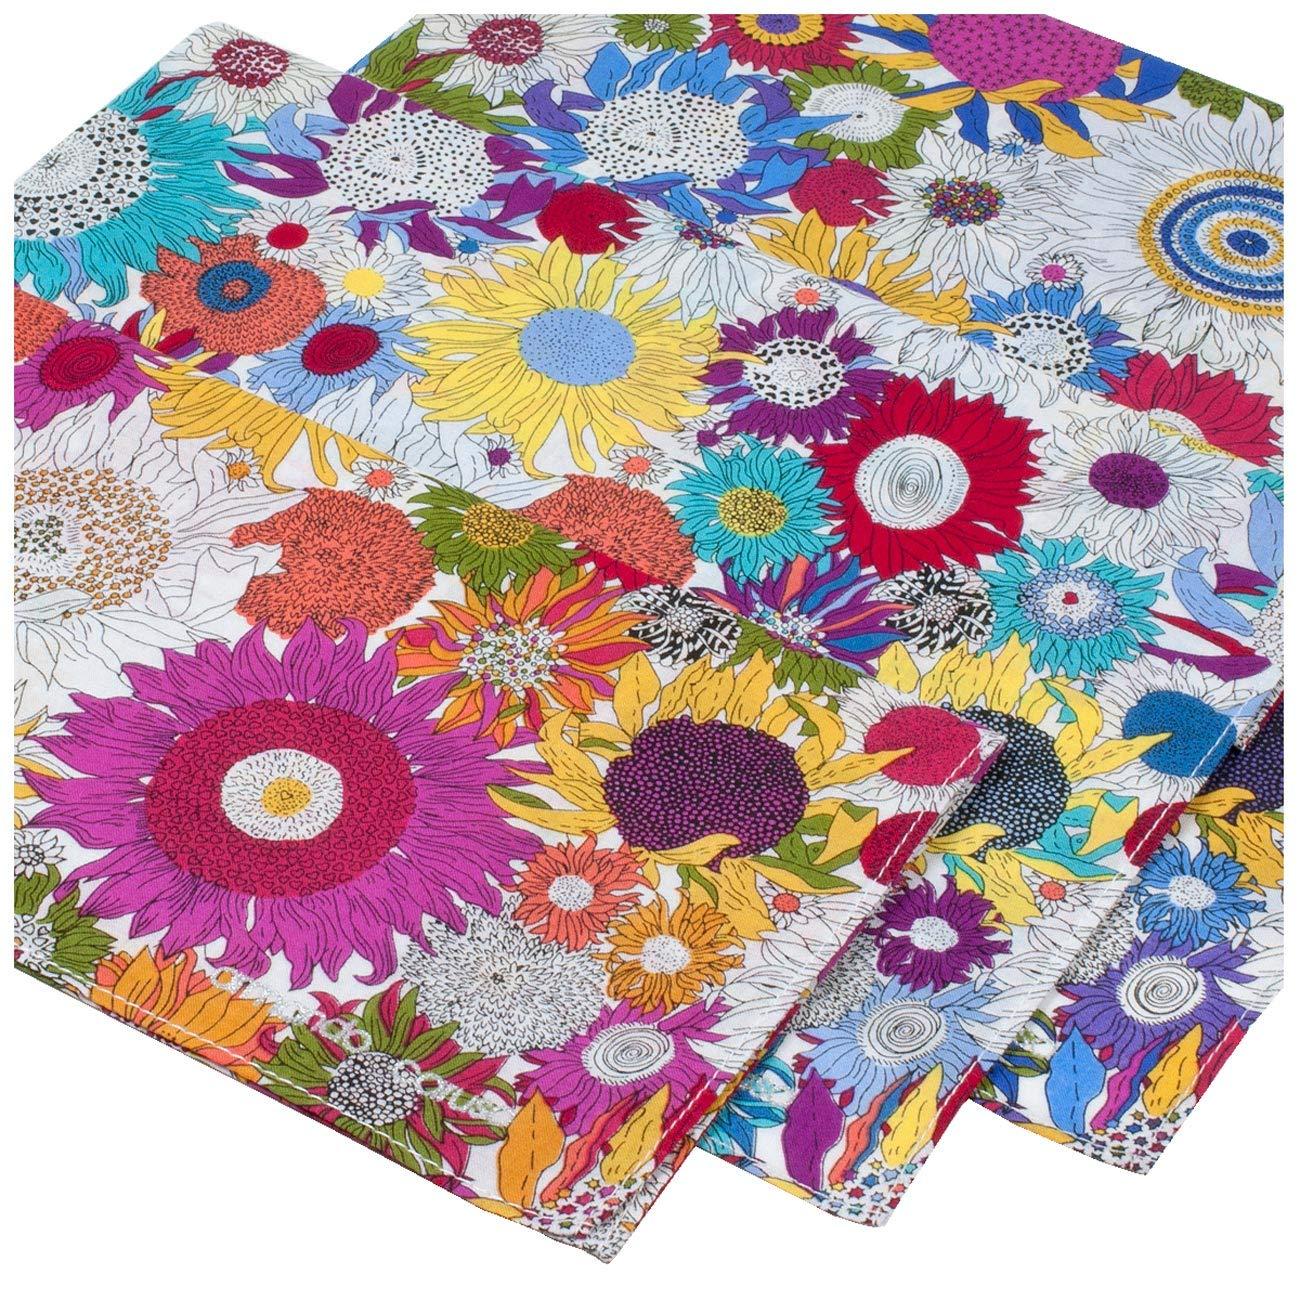 3 units Armando Caruso Ambroisie handkerchiefs